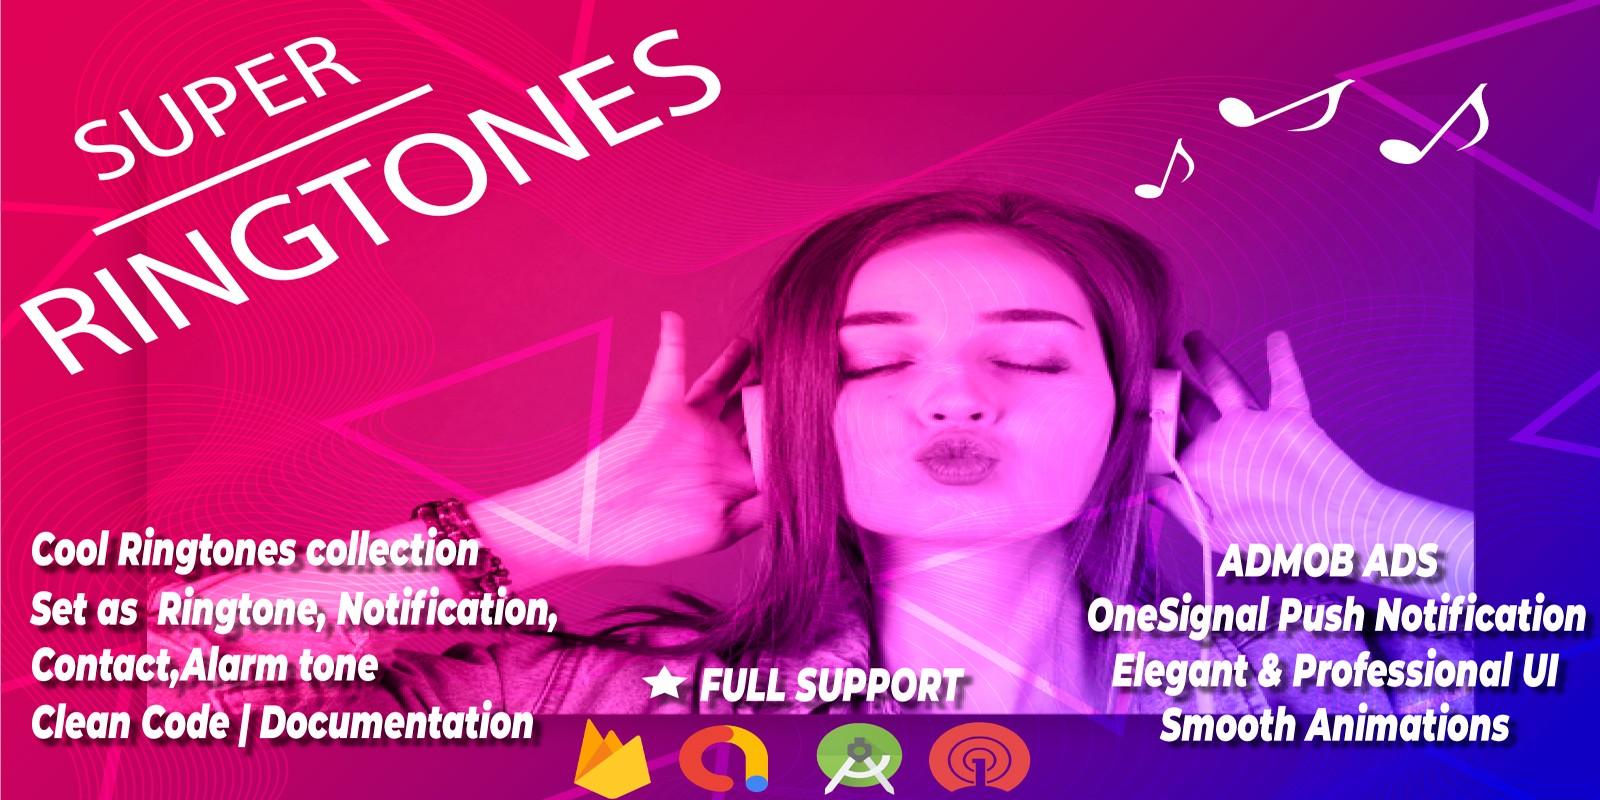 Super Ringtones - Android Source Code